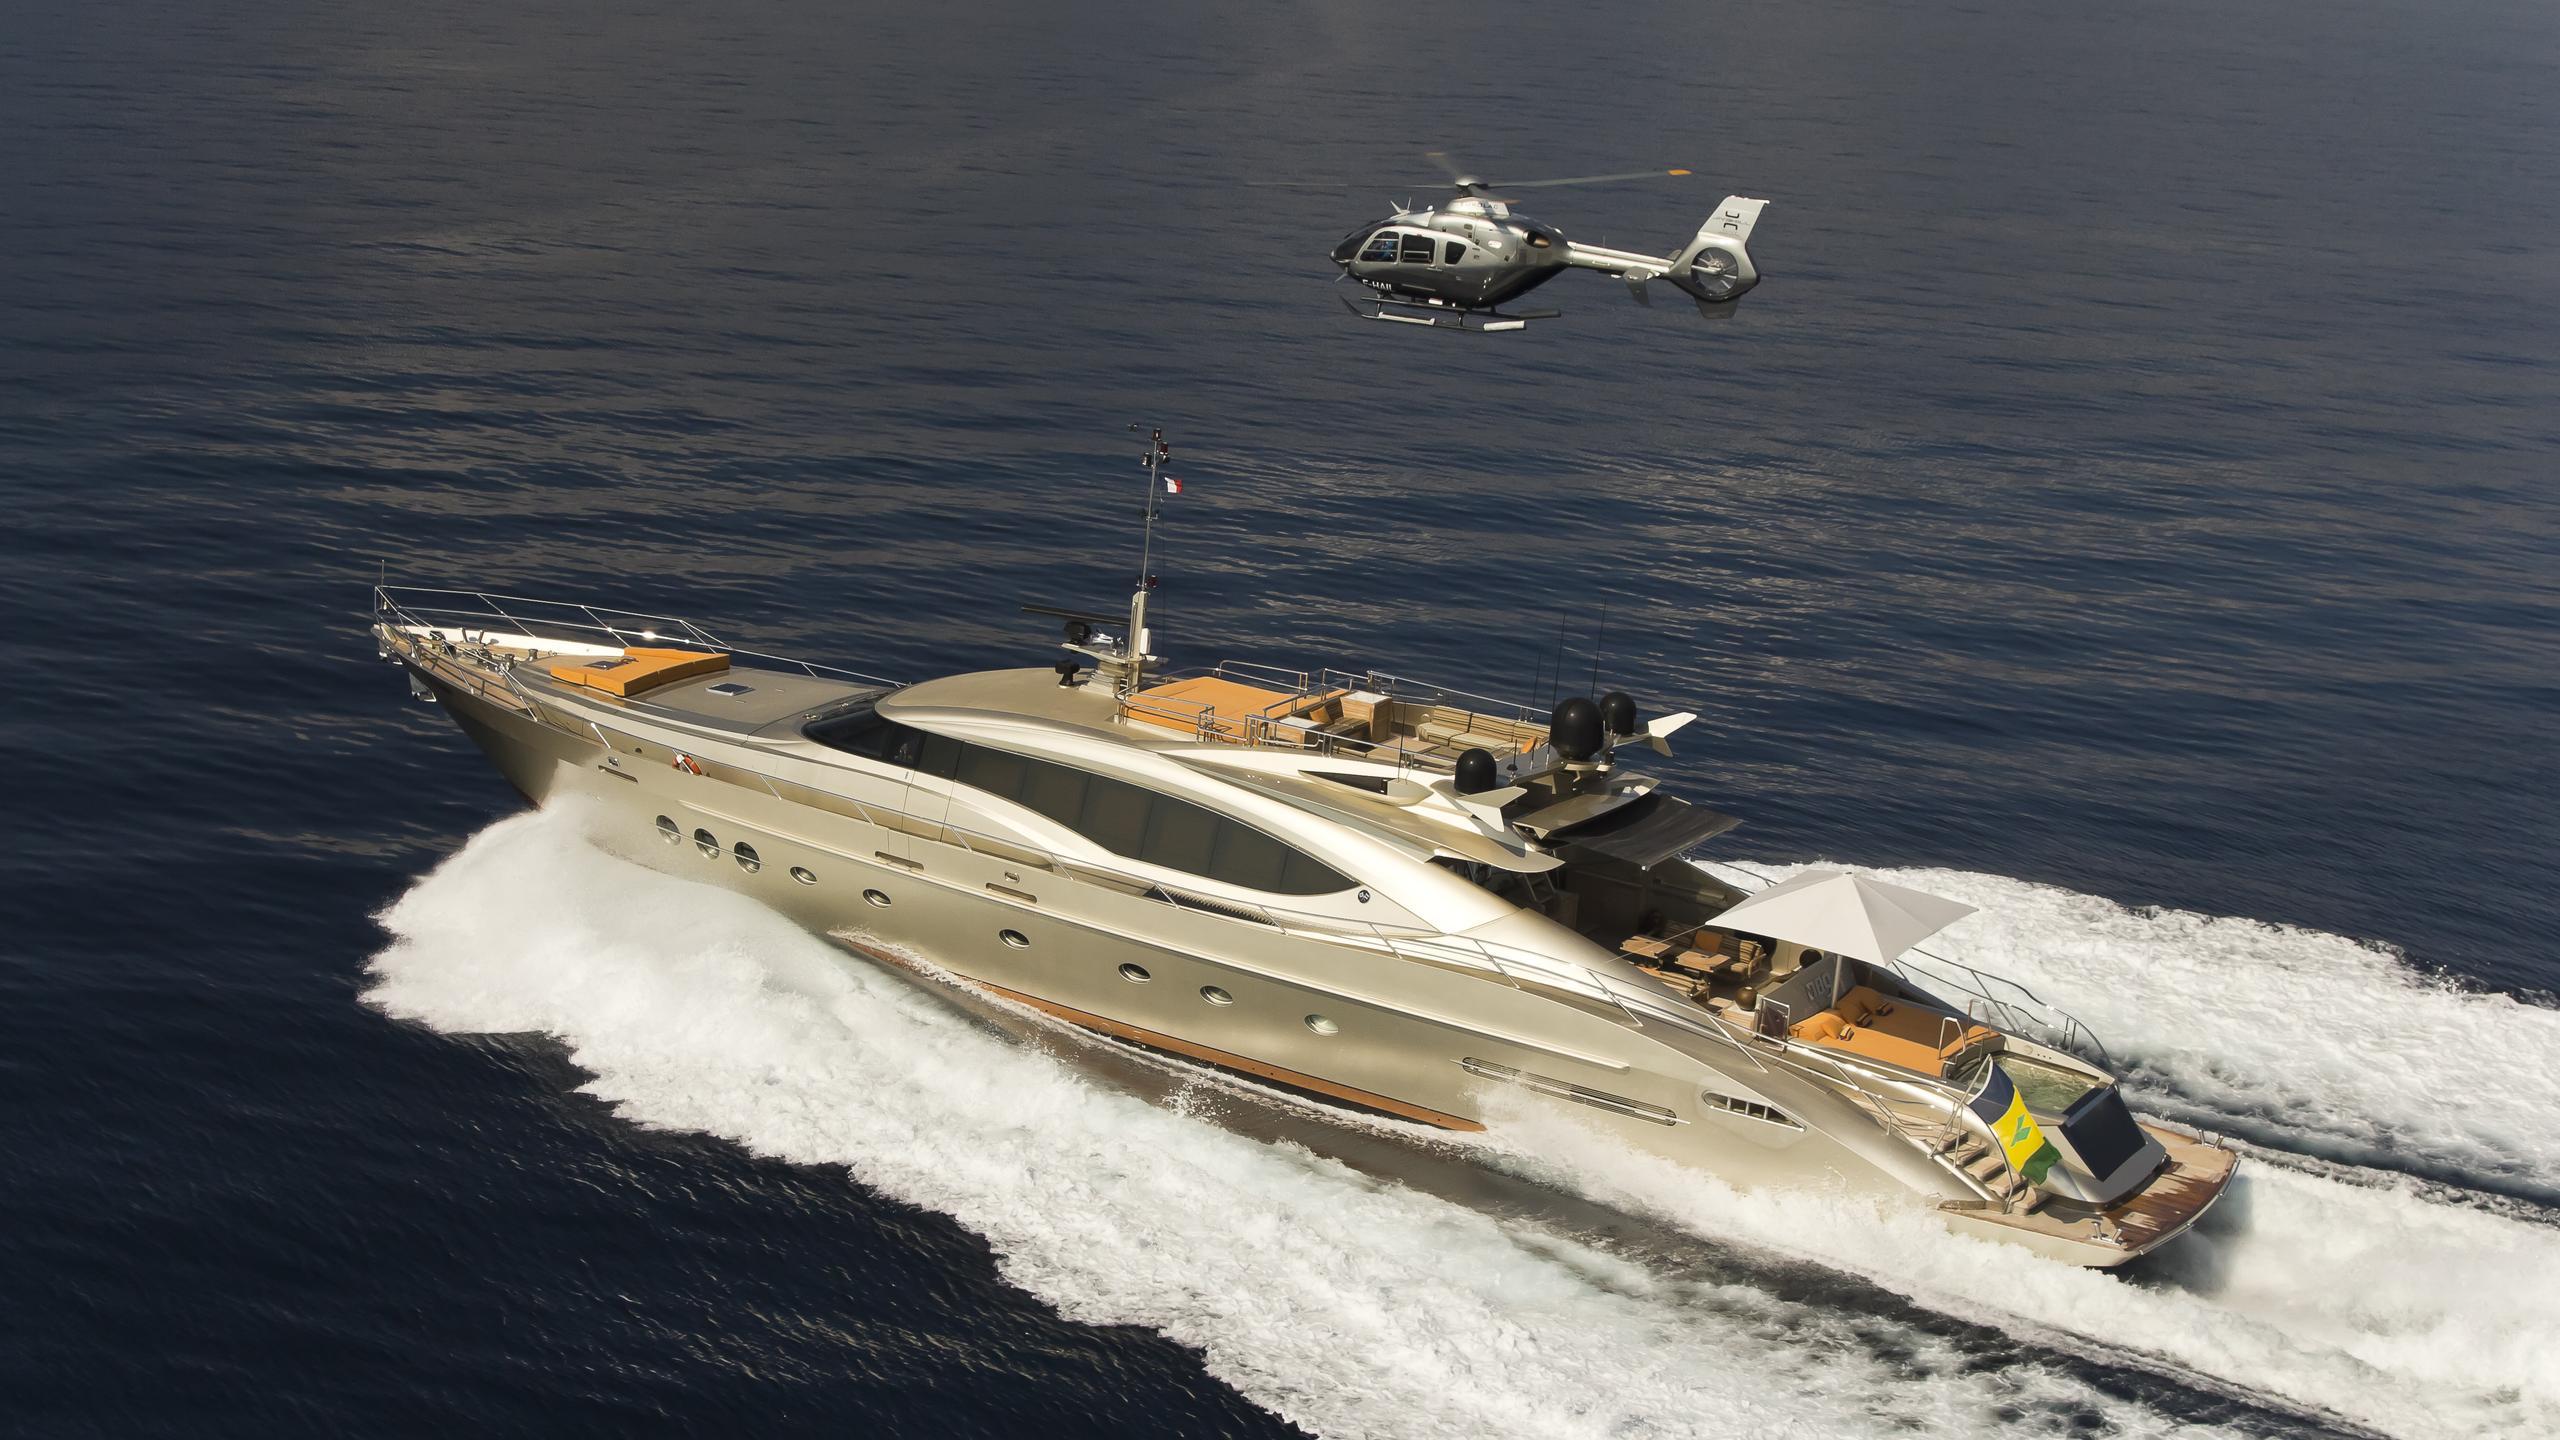 lucy ii db9 khalila motoryacht palmer johnson 120 37m 2005 profile after refit